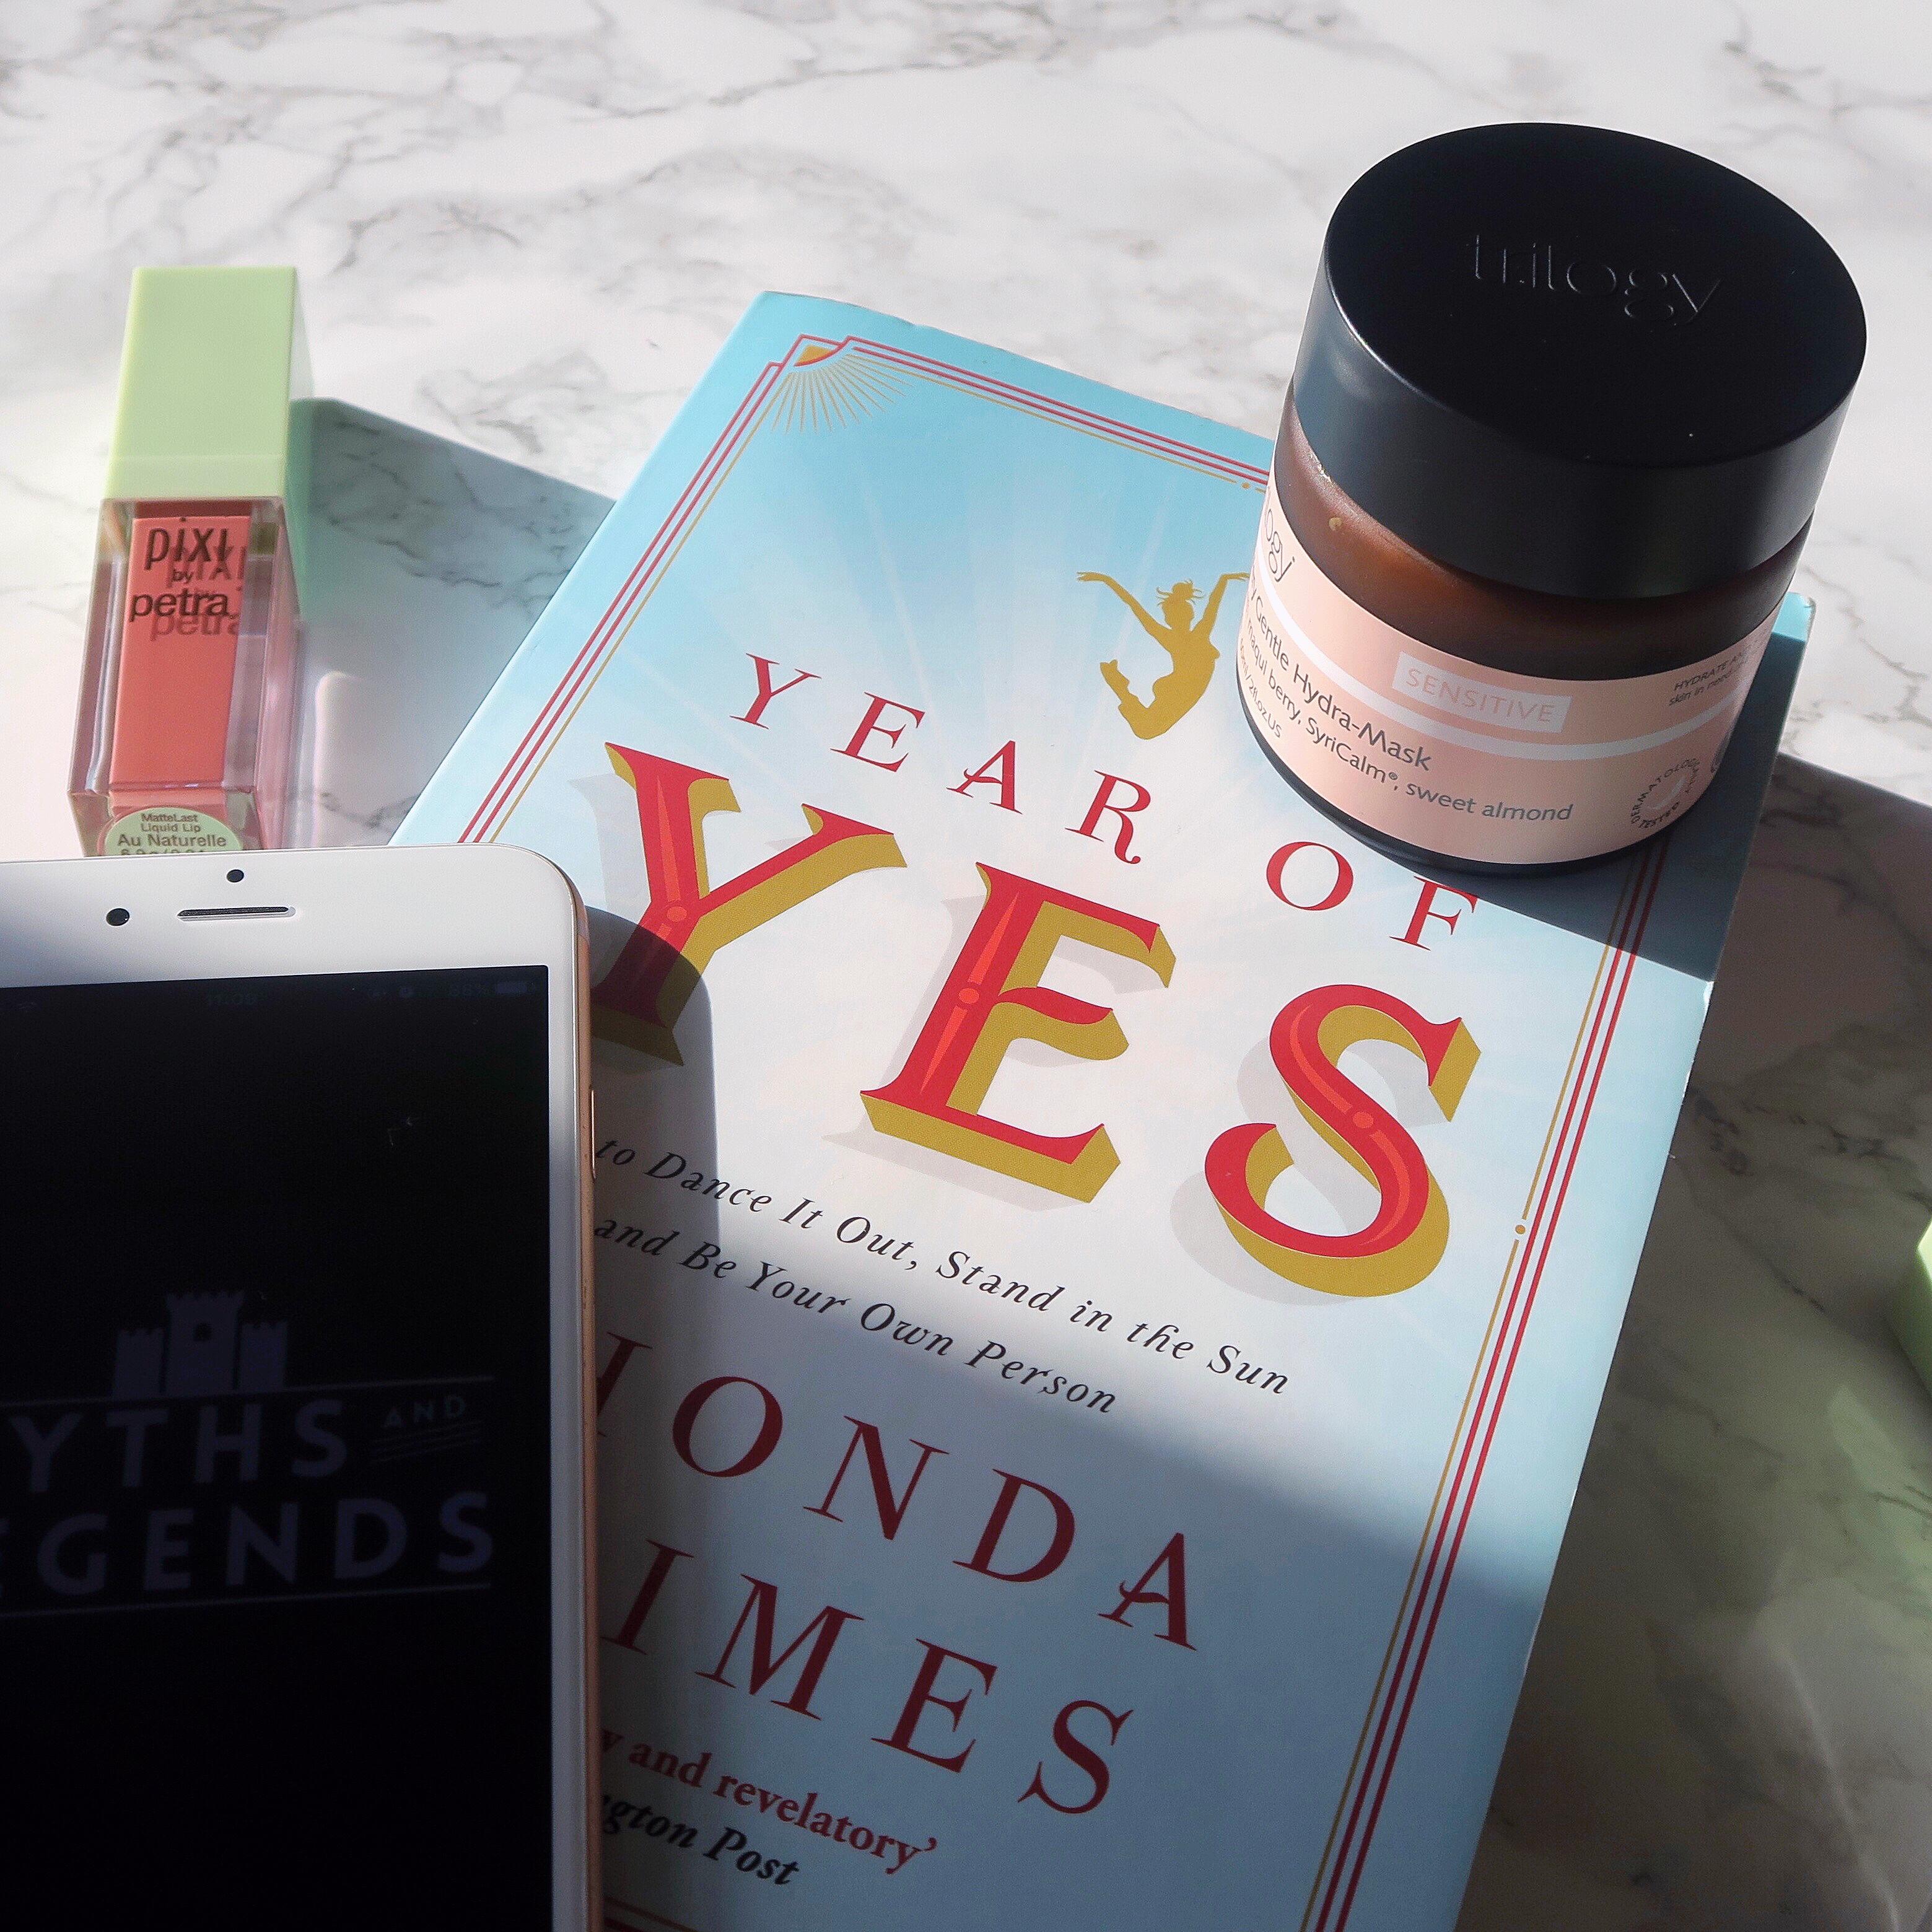 What I'm loving this week: Year Of Yes (Shonda Rhimes)